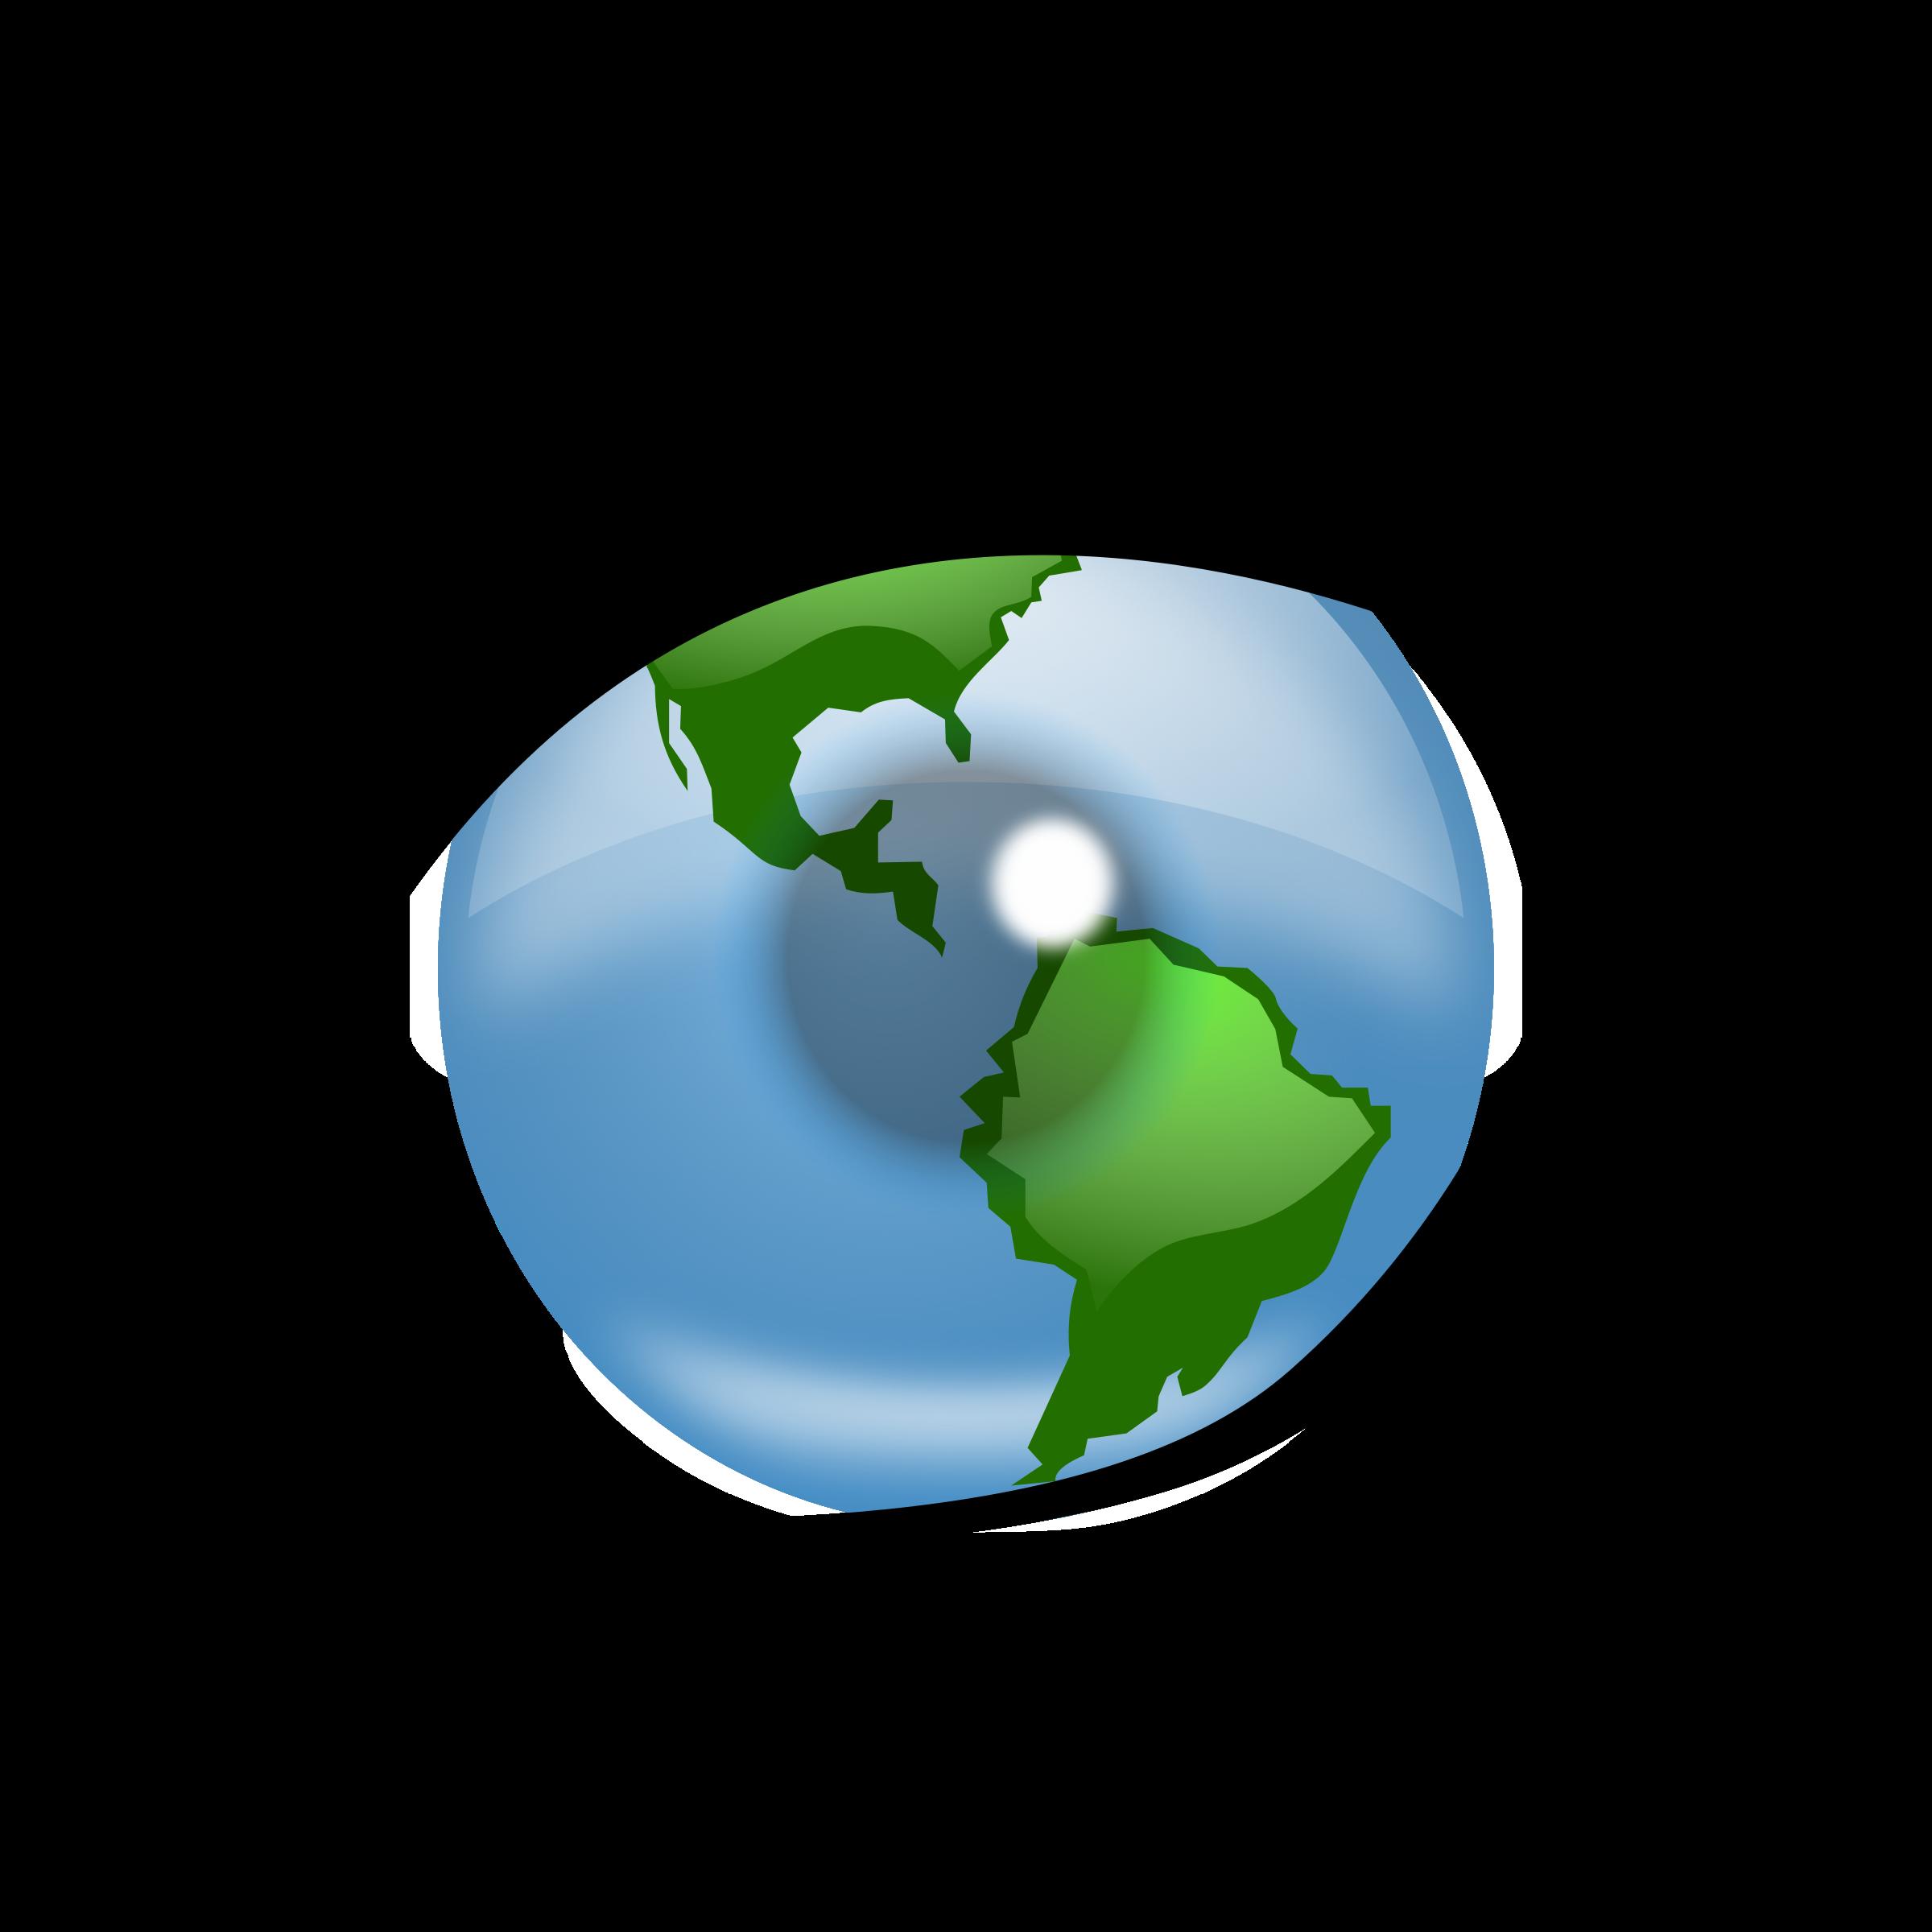 Clipart world world logo. Eye can see the